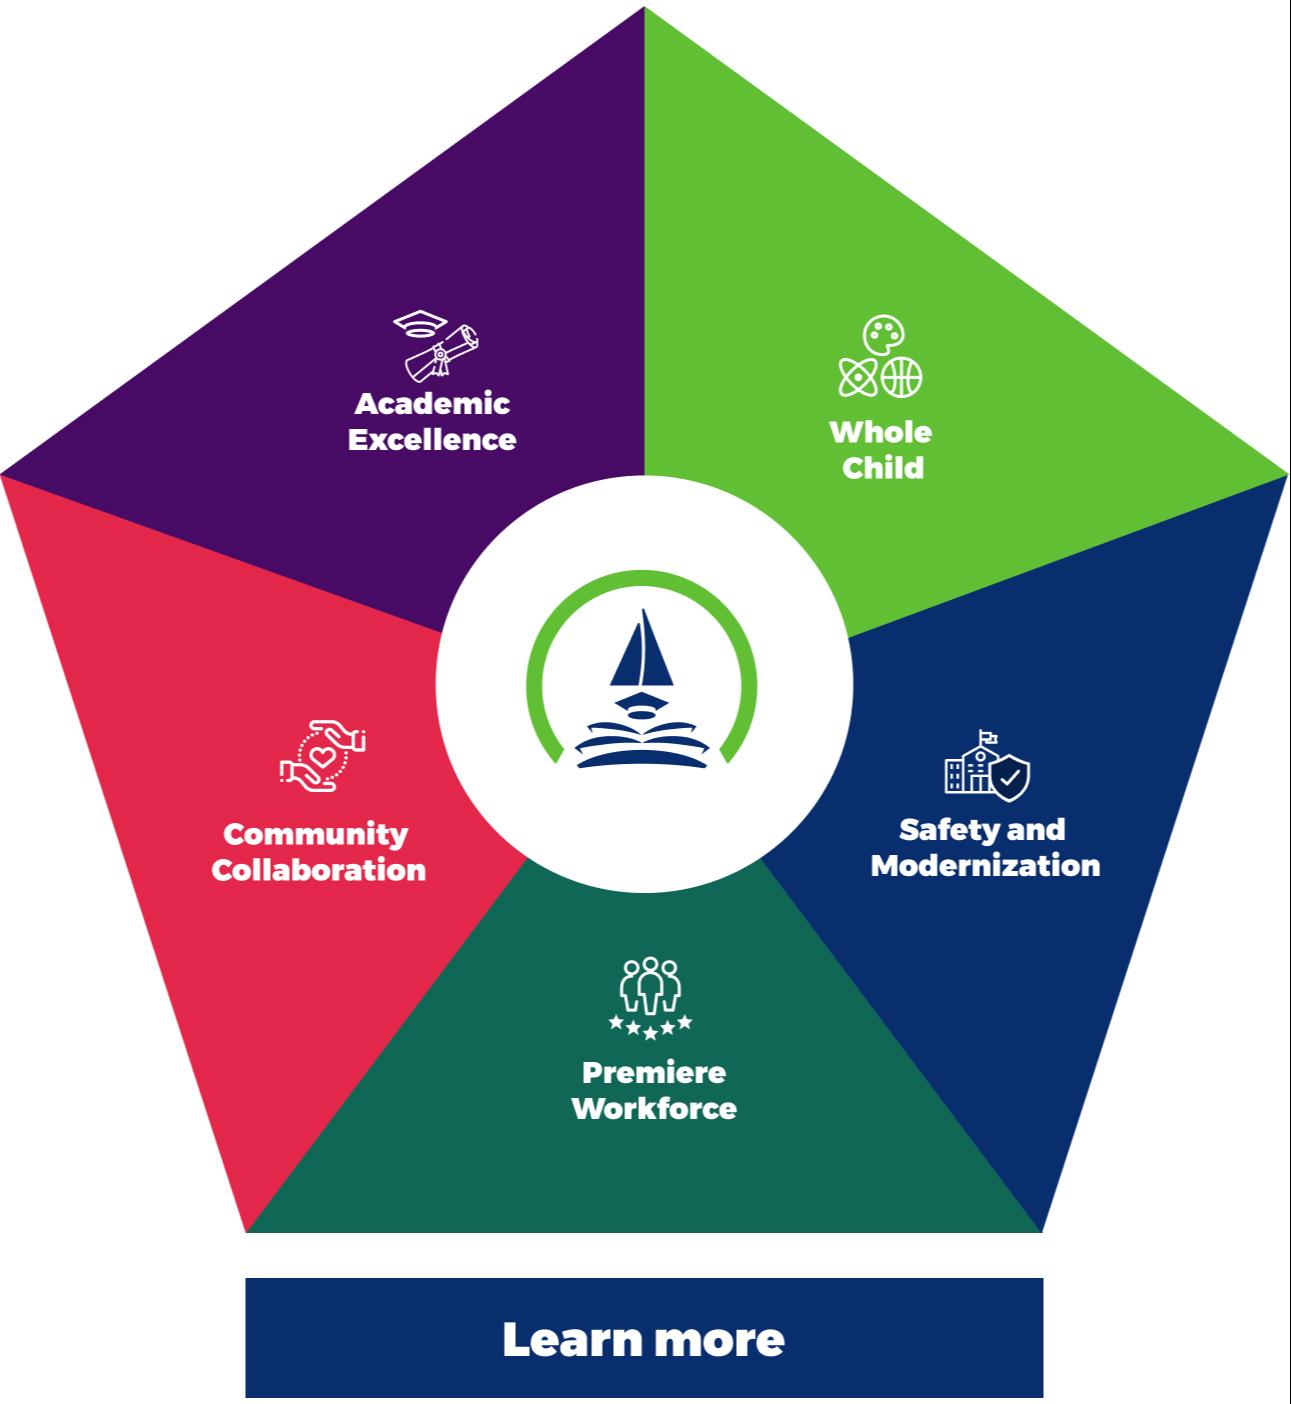 5 areas of focus